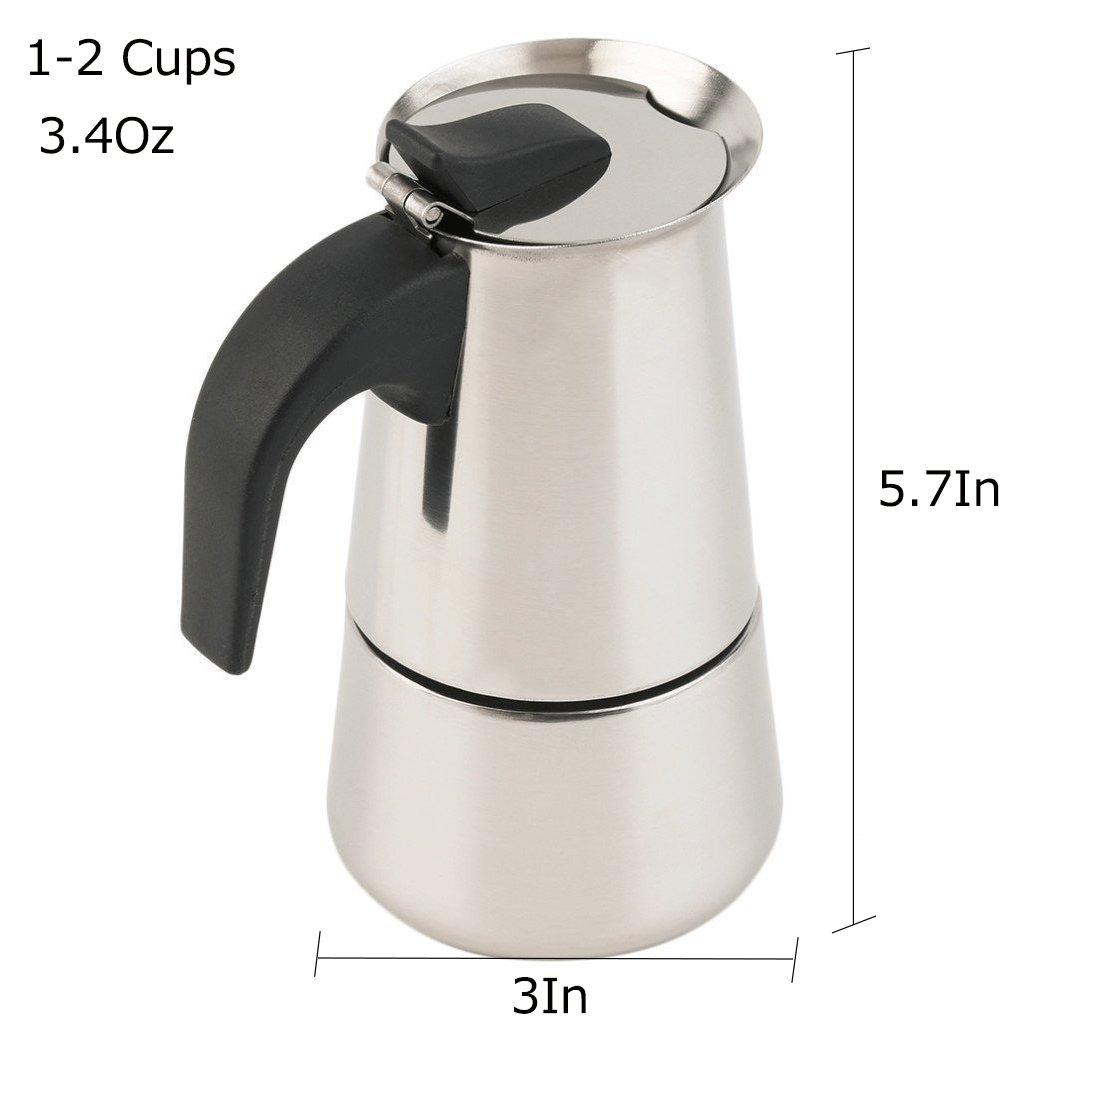 Espresso Maker Stovetop Moka Coffee Pot Stainless Steel Latte Percolator with Bonus Scoop (2 Cups/100 Milliliter) by Espresso Maker (Image #3)